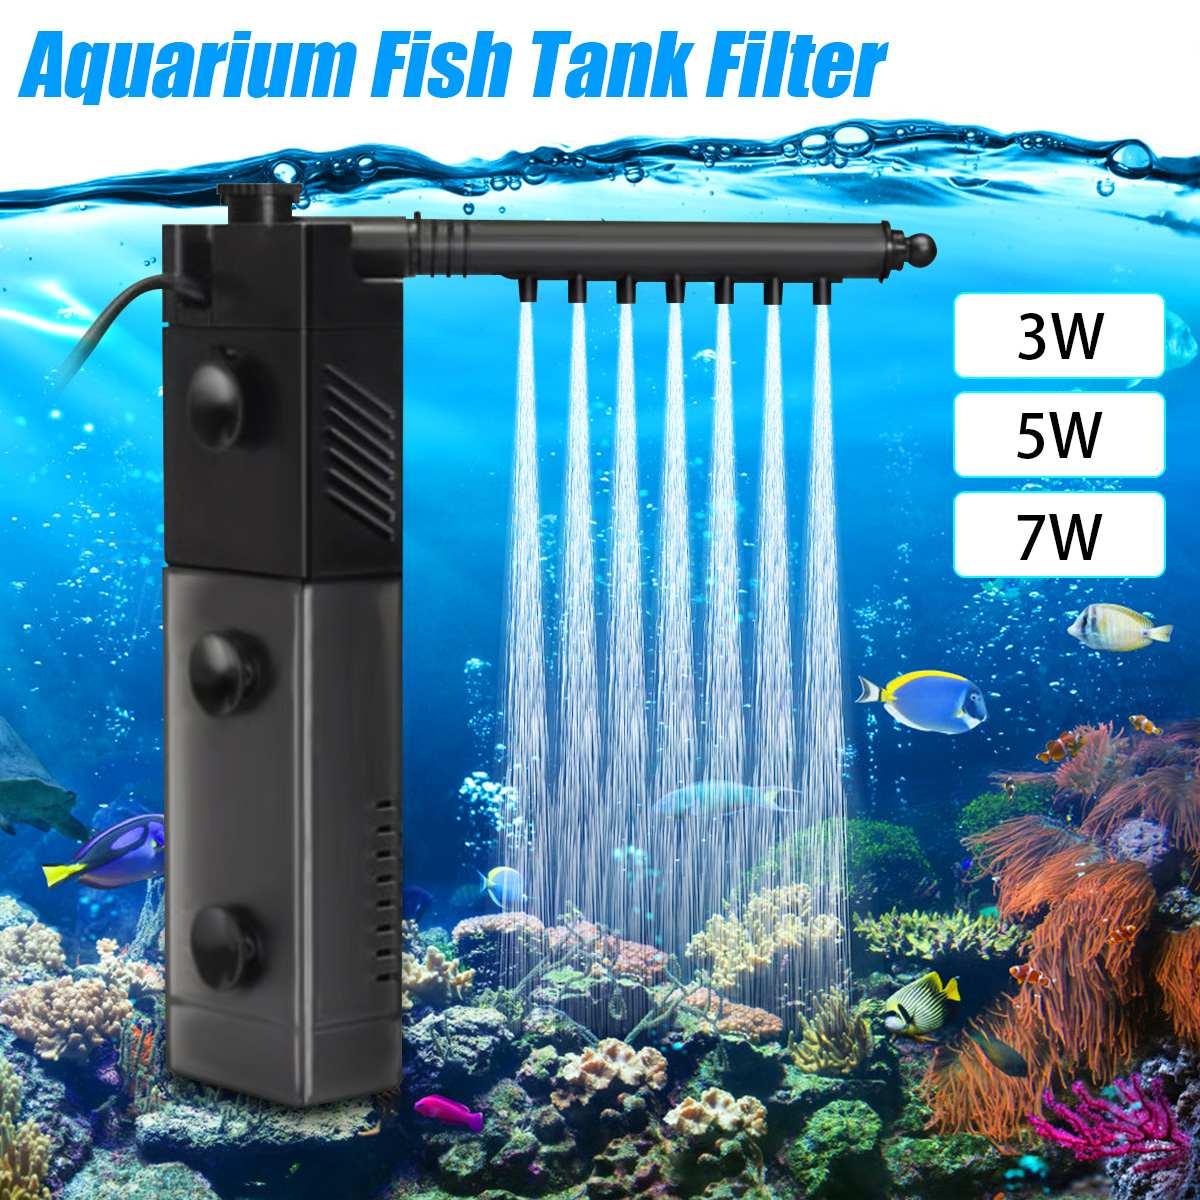 220V 3in1 Aquarium Fish Tank Filter Aquarium Internal Filter Water Submersible Pump Fish Tank Oxygen Spray Tool 3W/5W/7W